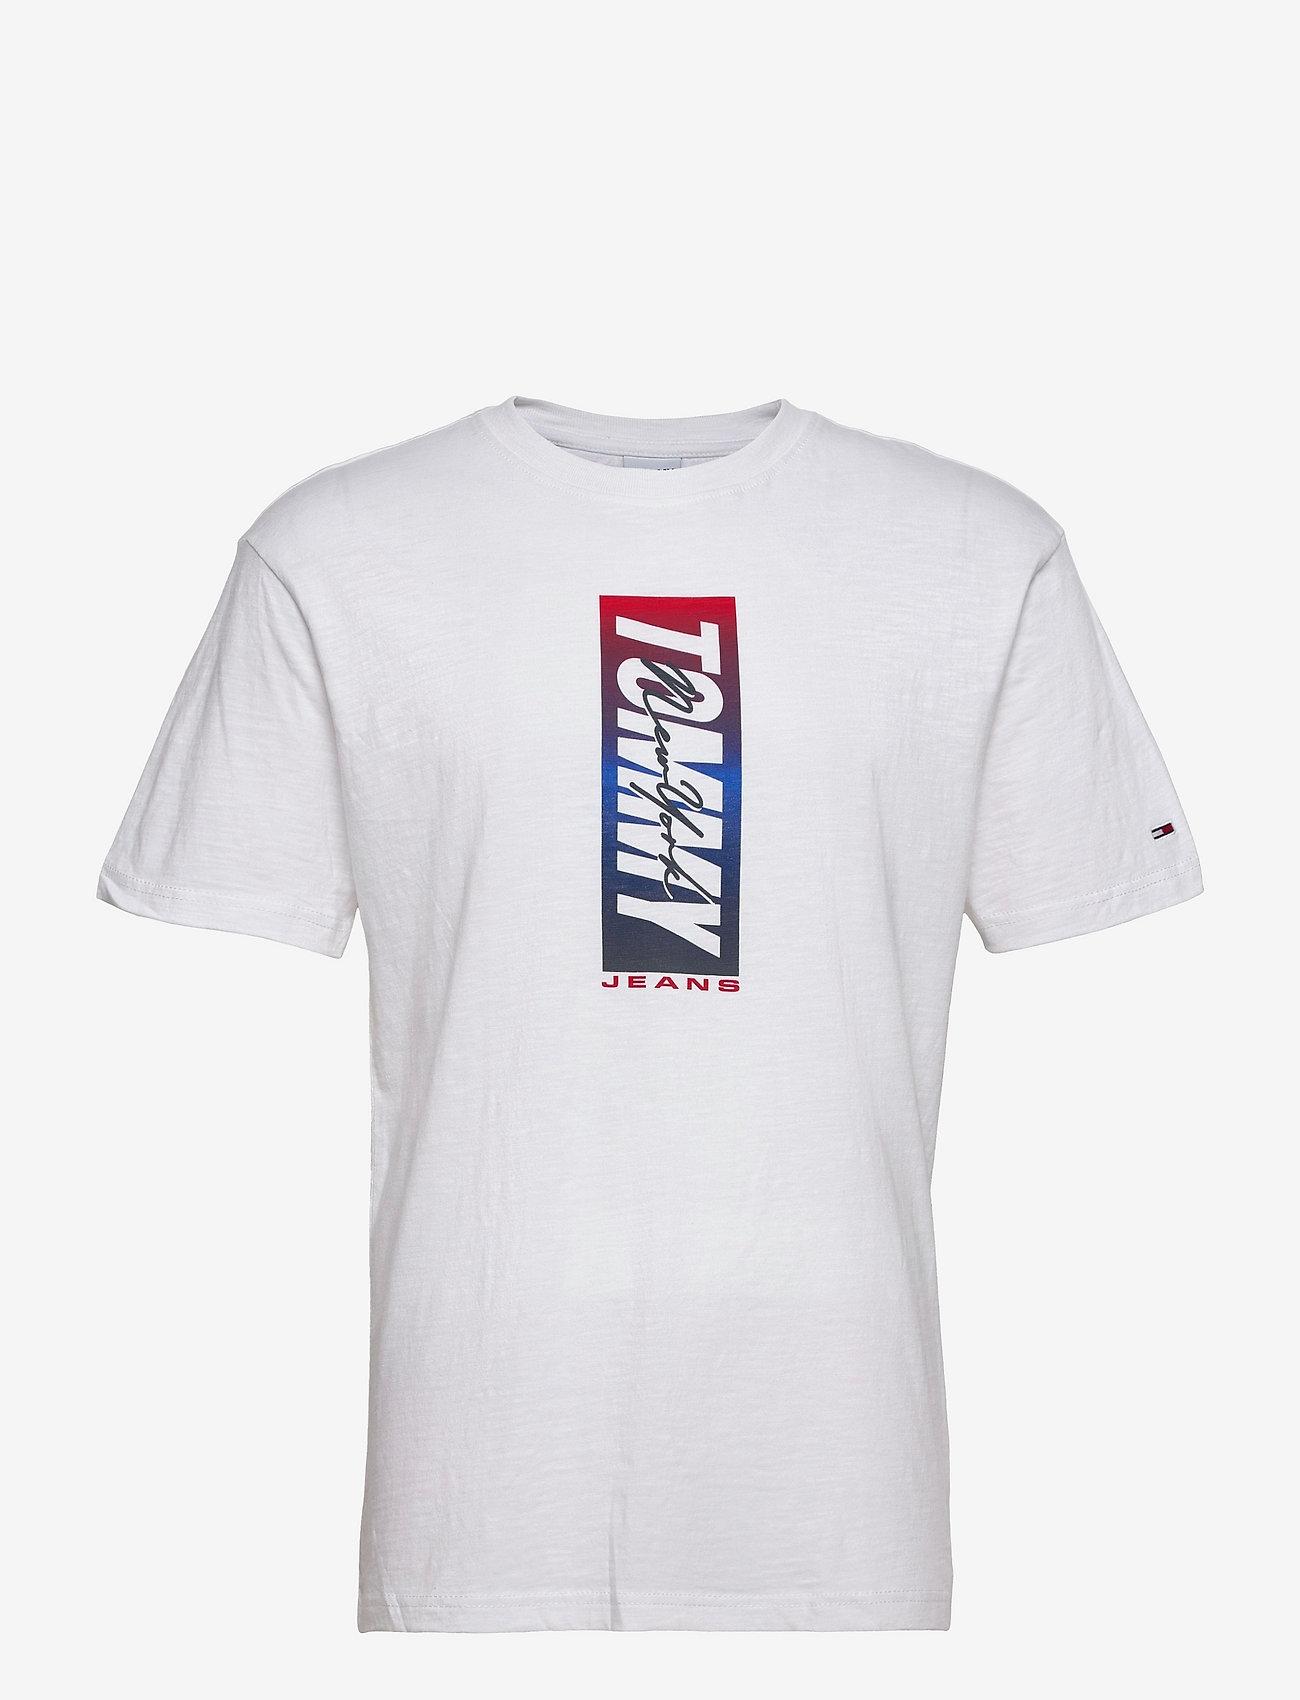 Tommy Jeans - TJM VERTICAL FRONT LOGO BOX TEE - t-shirts à manches courtes - white - 0